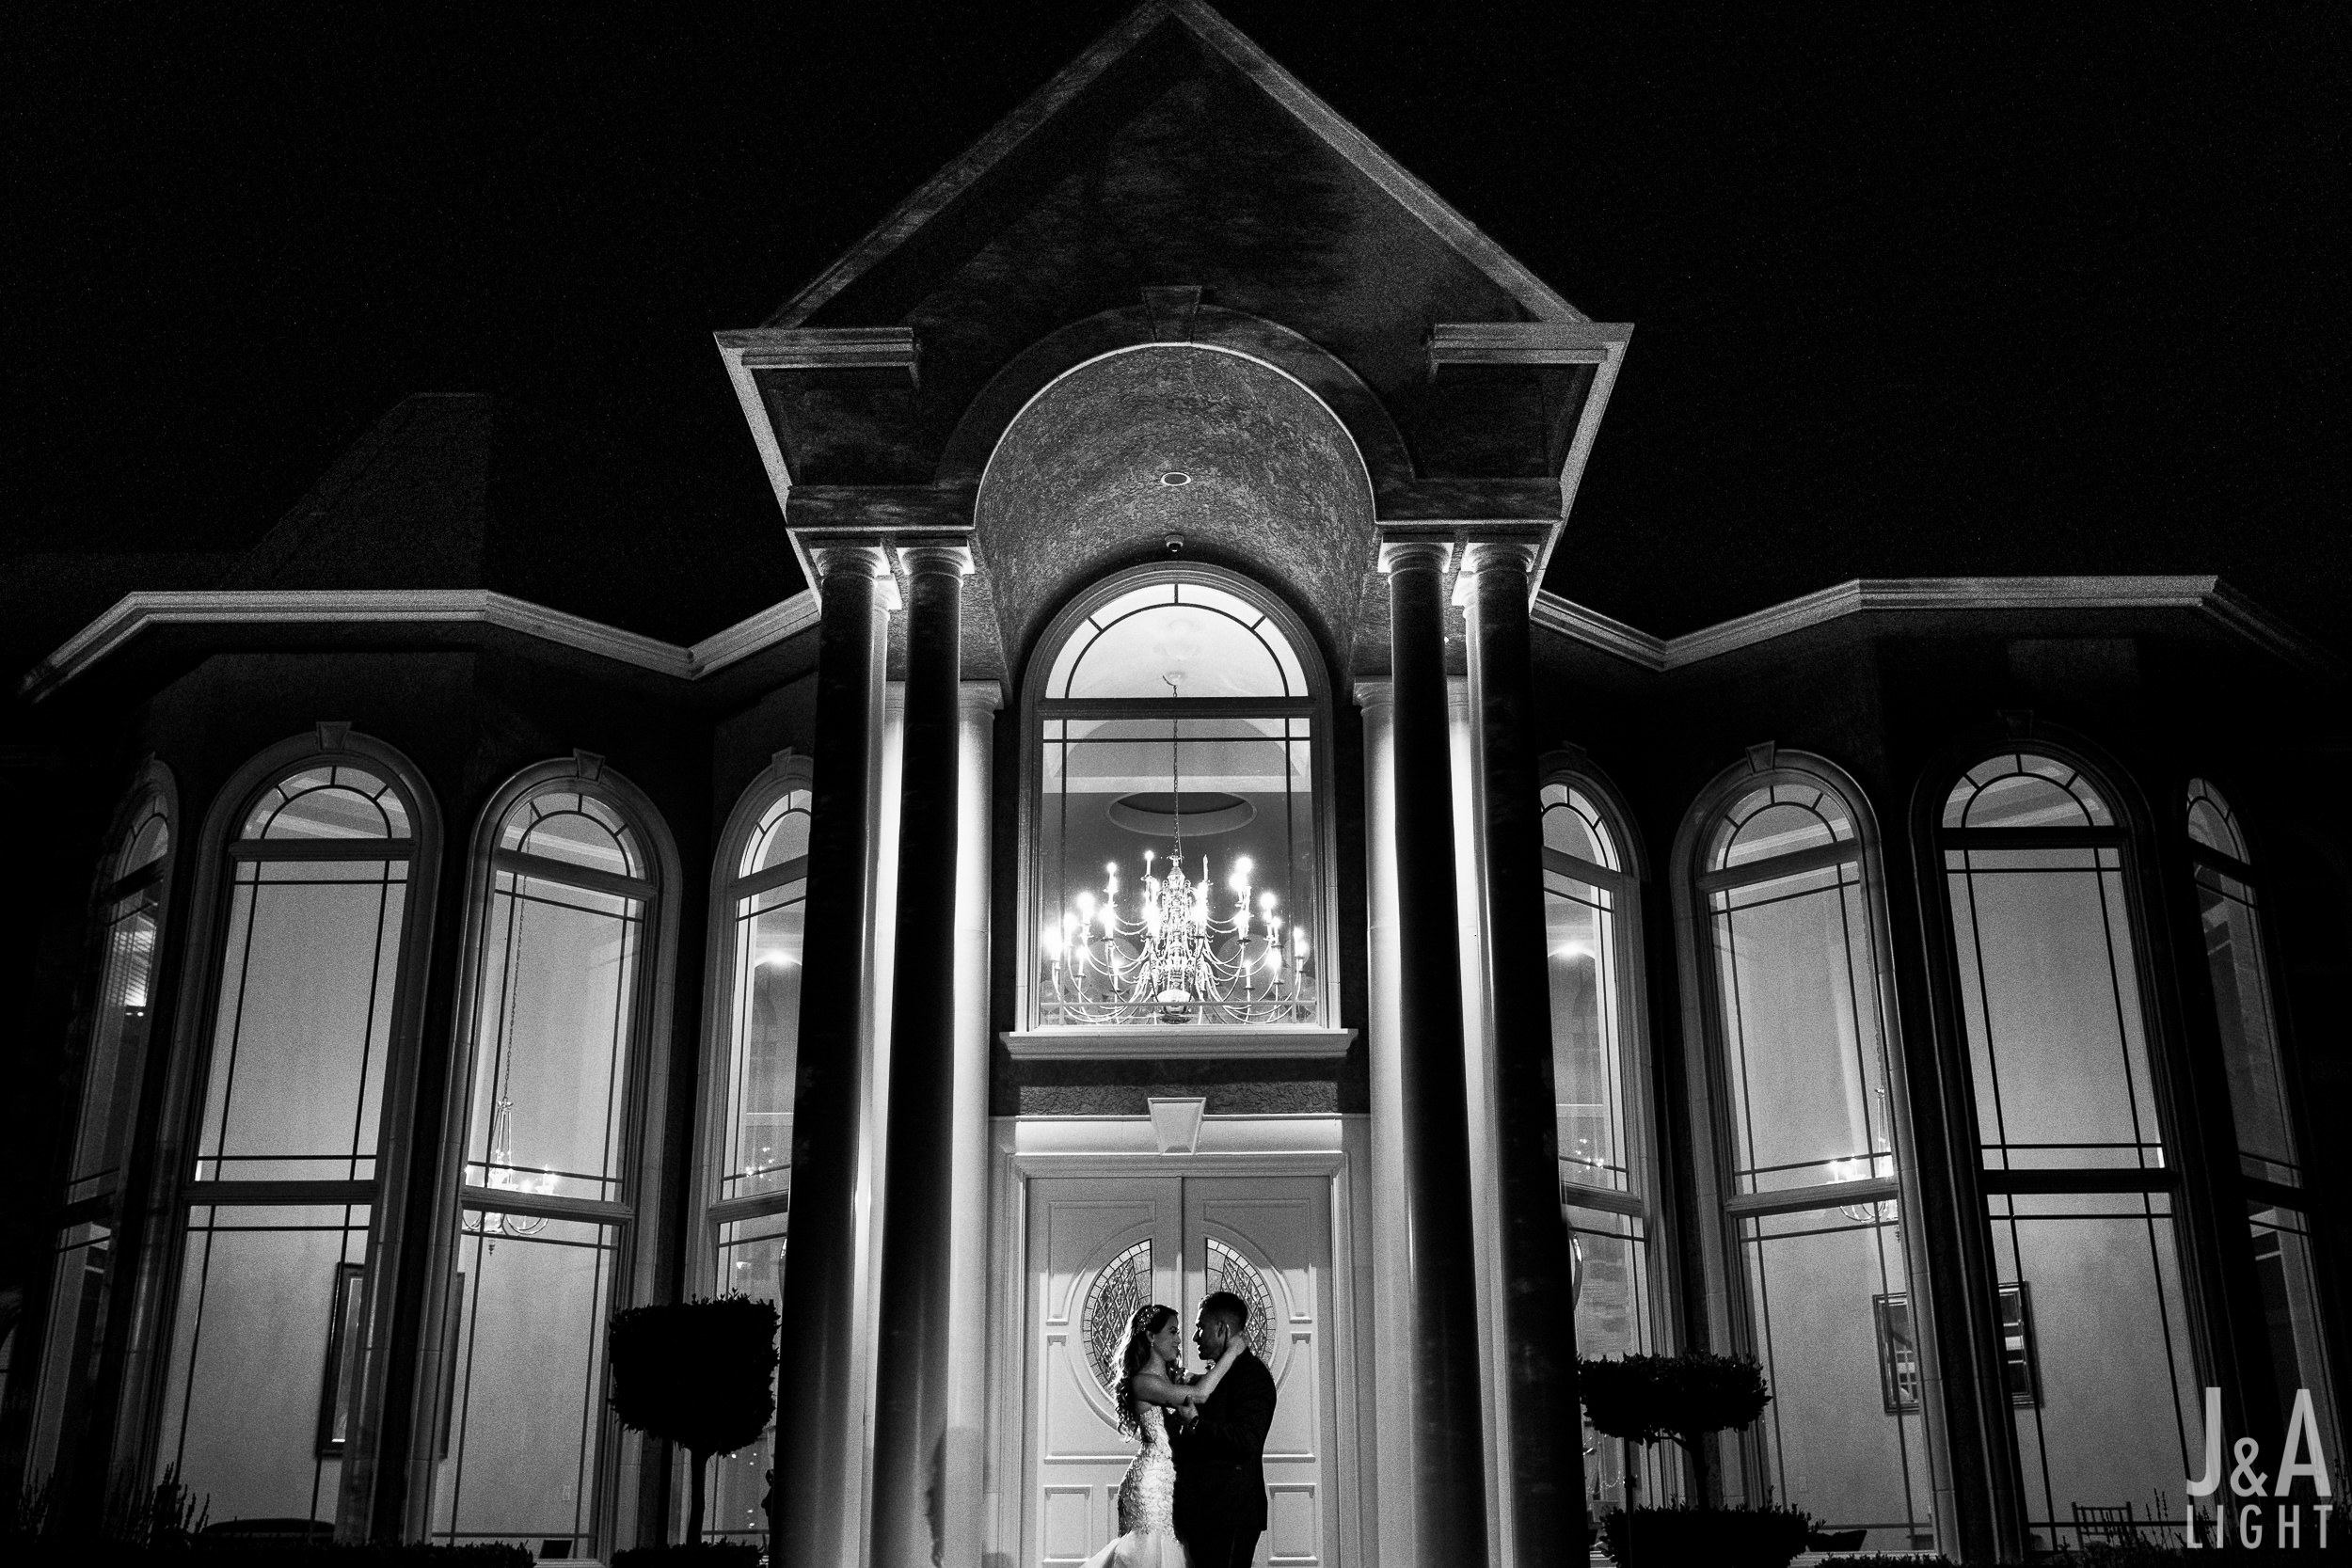 20171014-JanDan-LosBanos-GlassMansion-Wedding-Blog-097.jpg